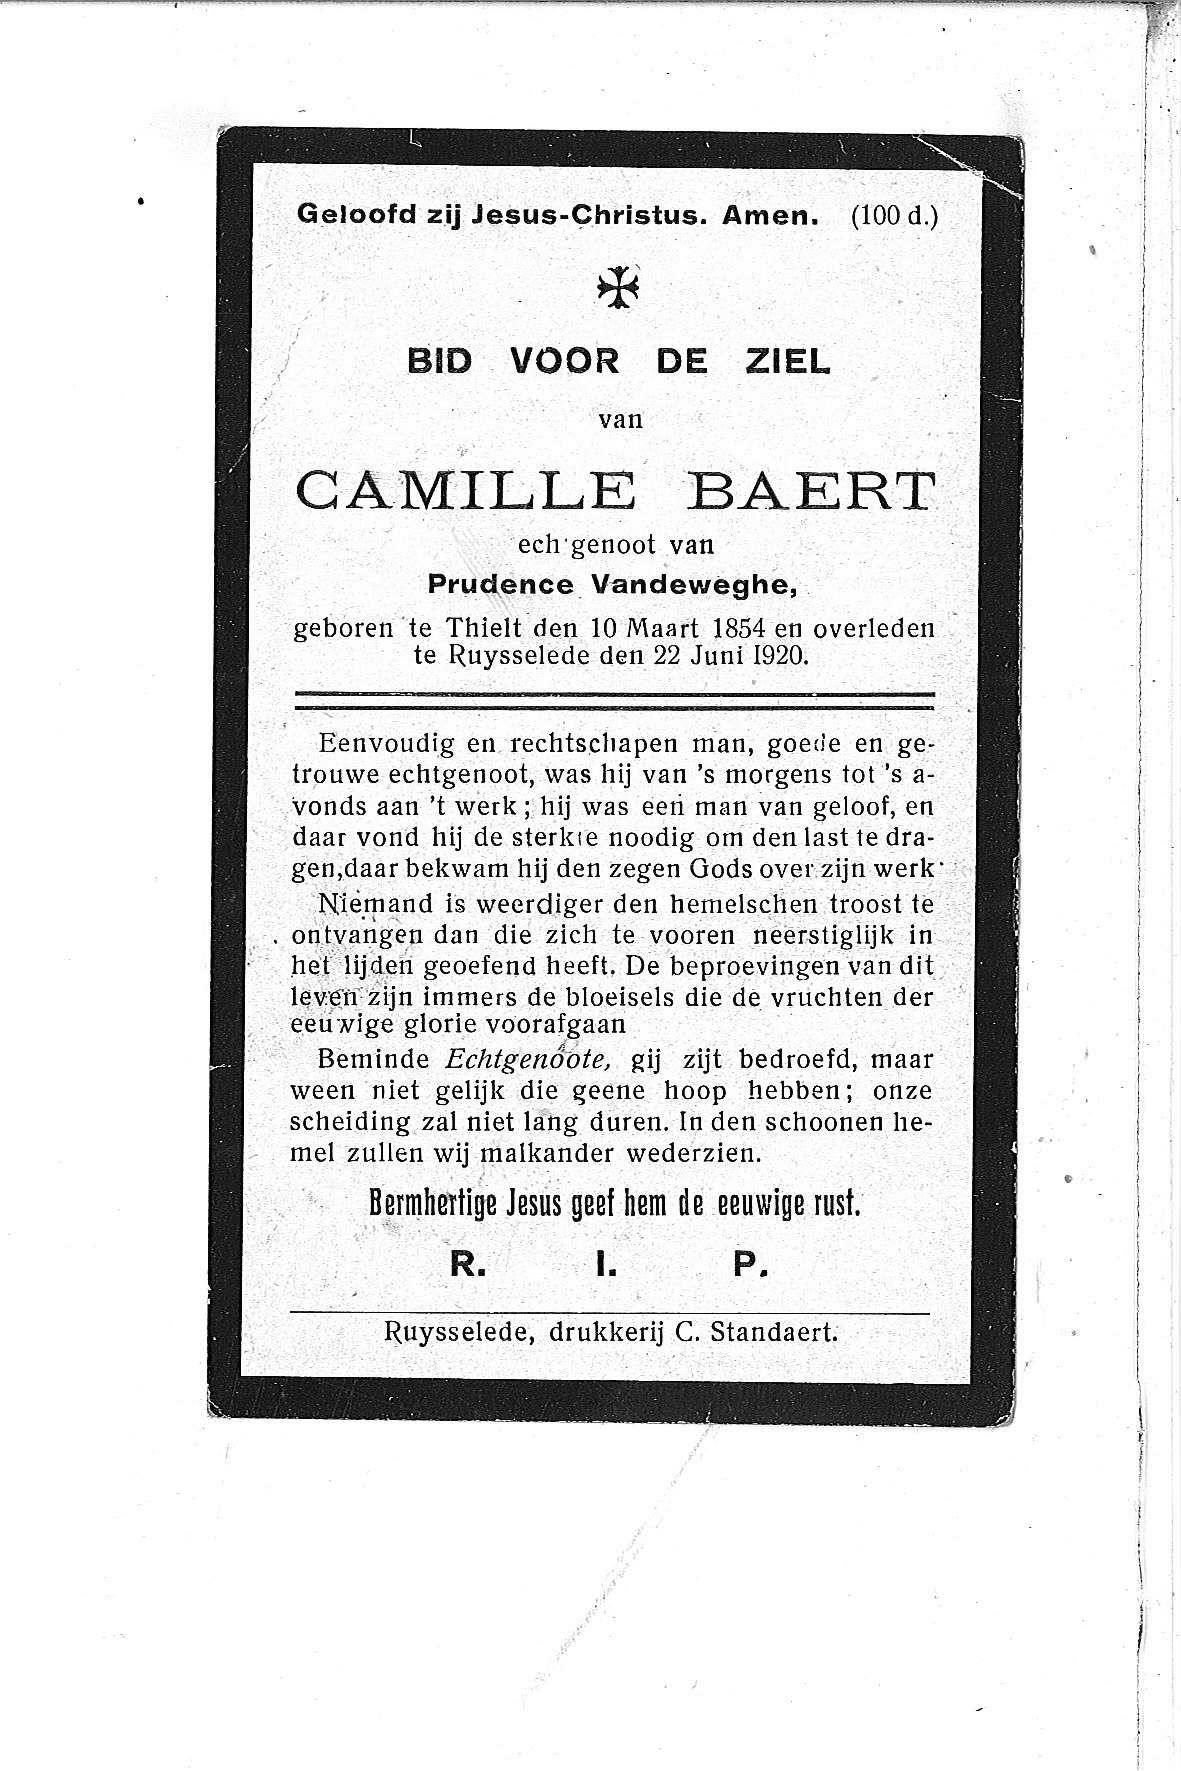 Camille(1920)20100929102653_00015.jpg